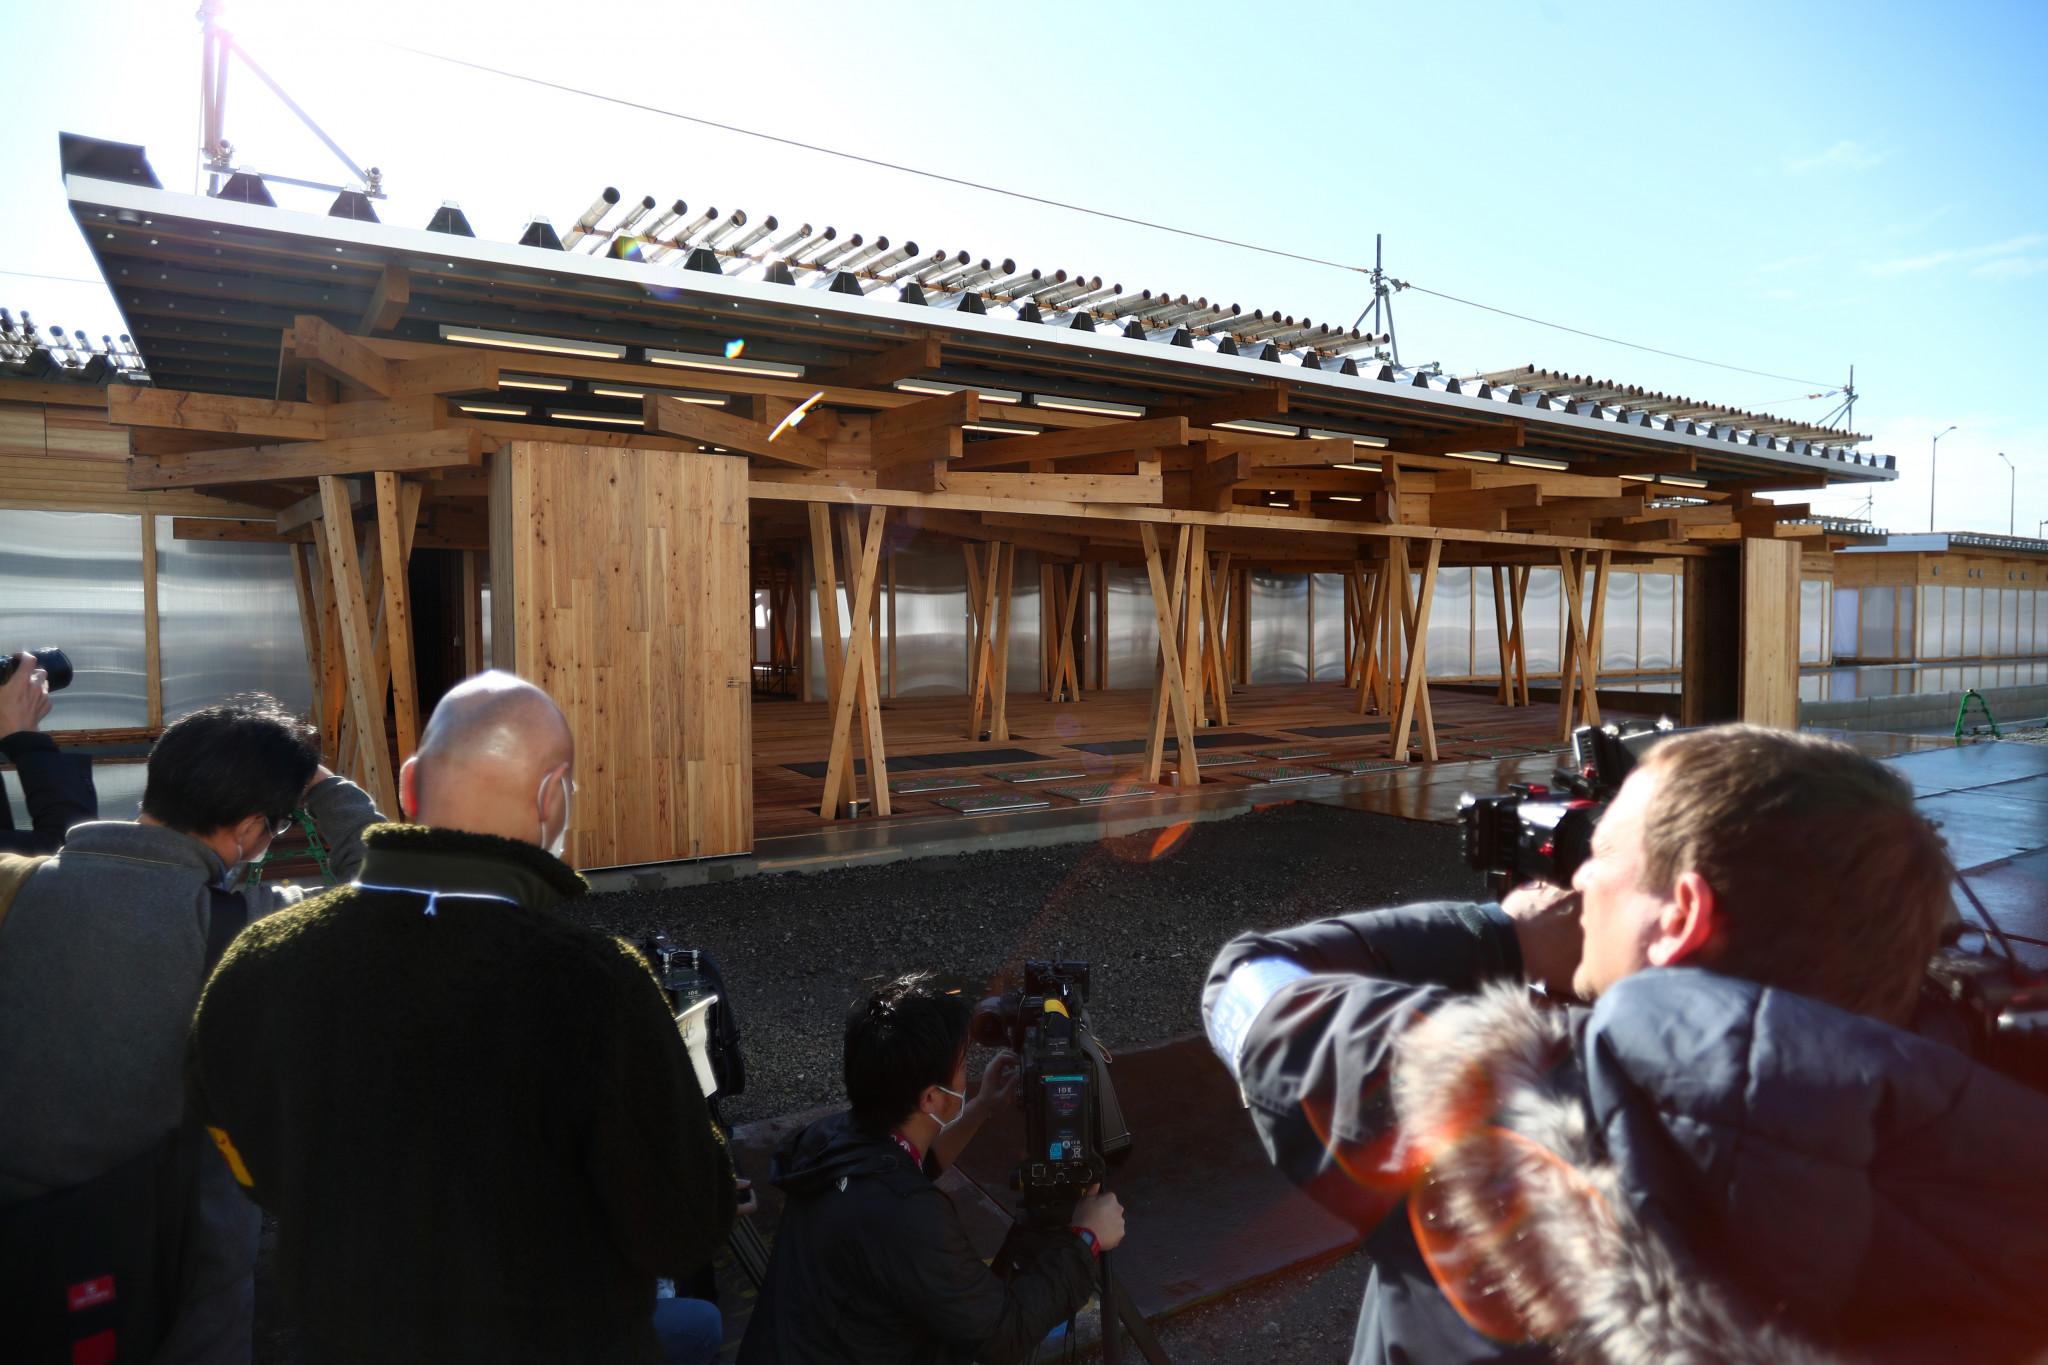 Tokyo 2020 hosts press tour of Plaza in Athletes' Village